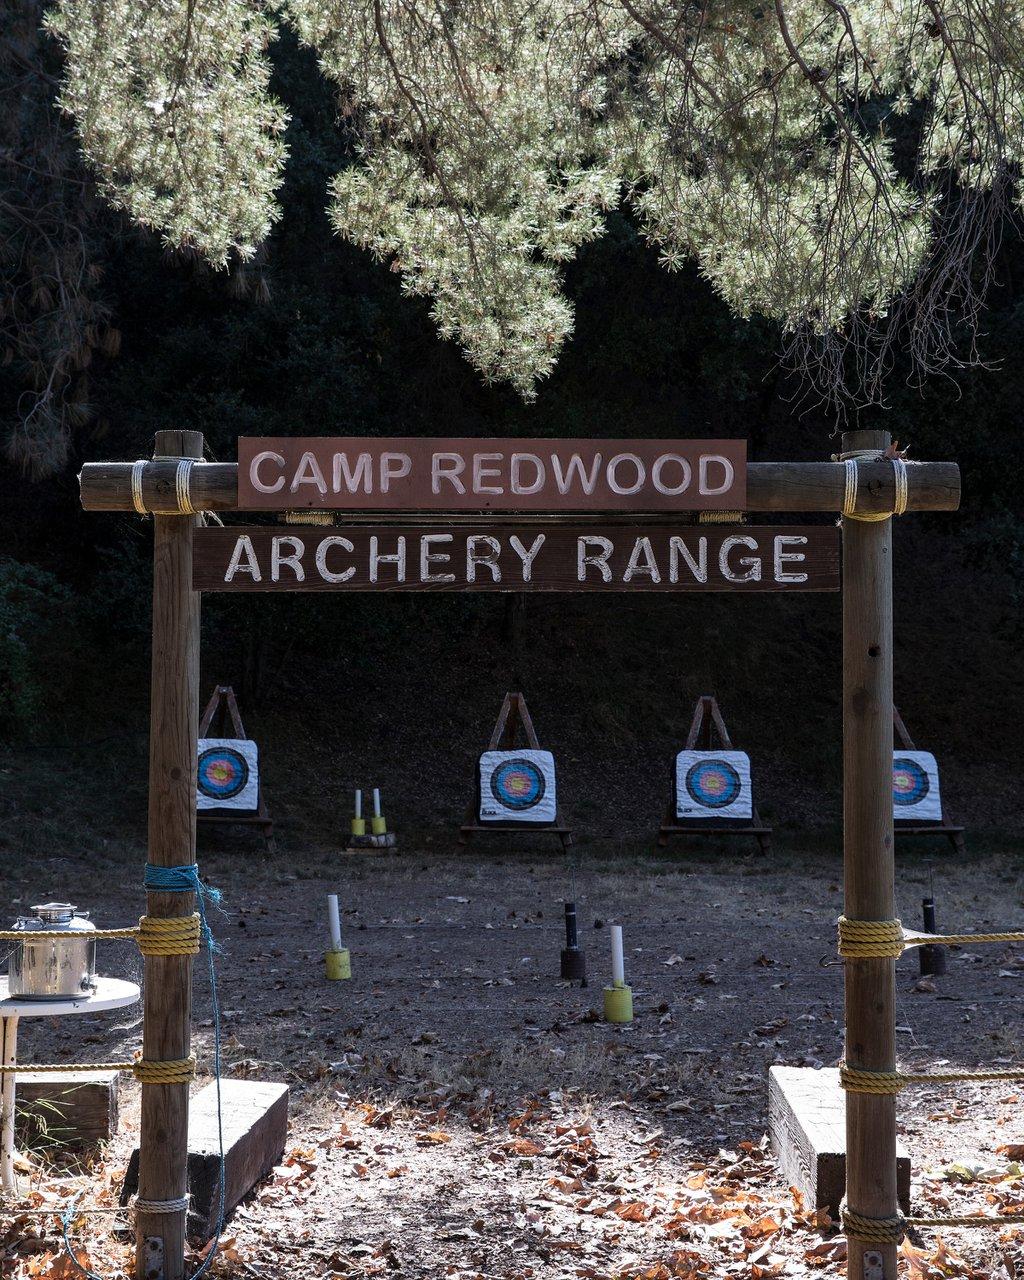 AHS:1984 The Camp Redwood Experience photo 5E8A8285.jpg